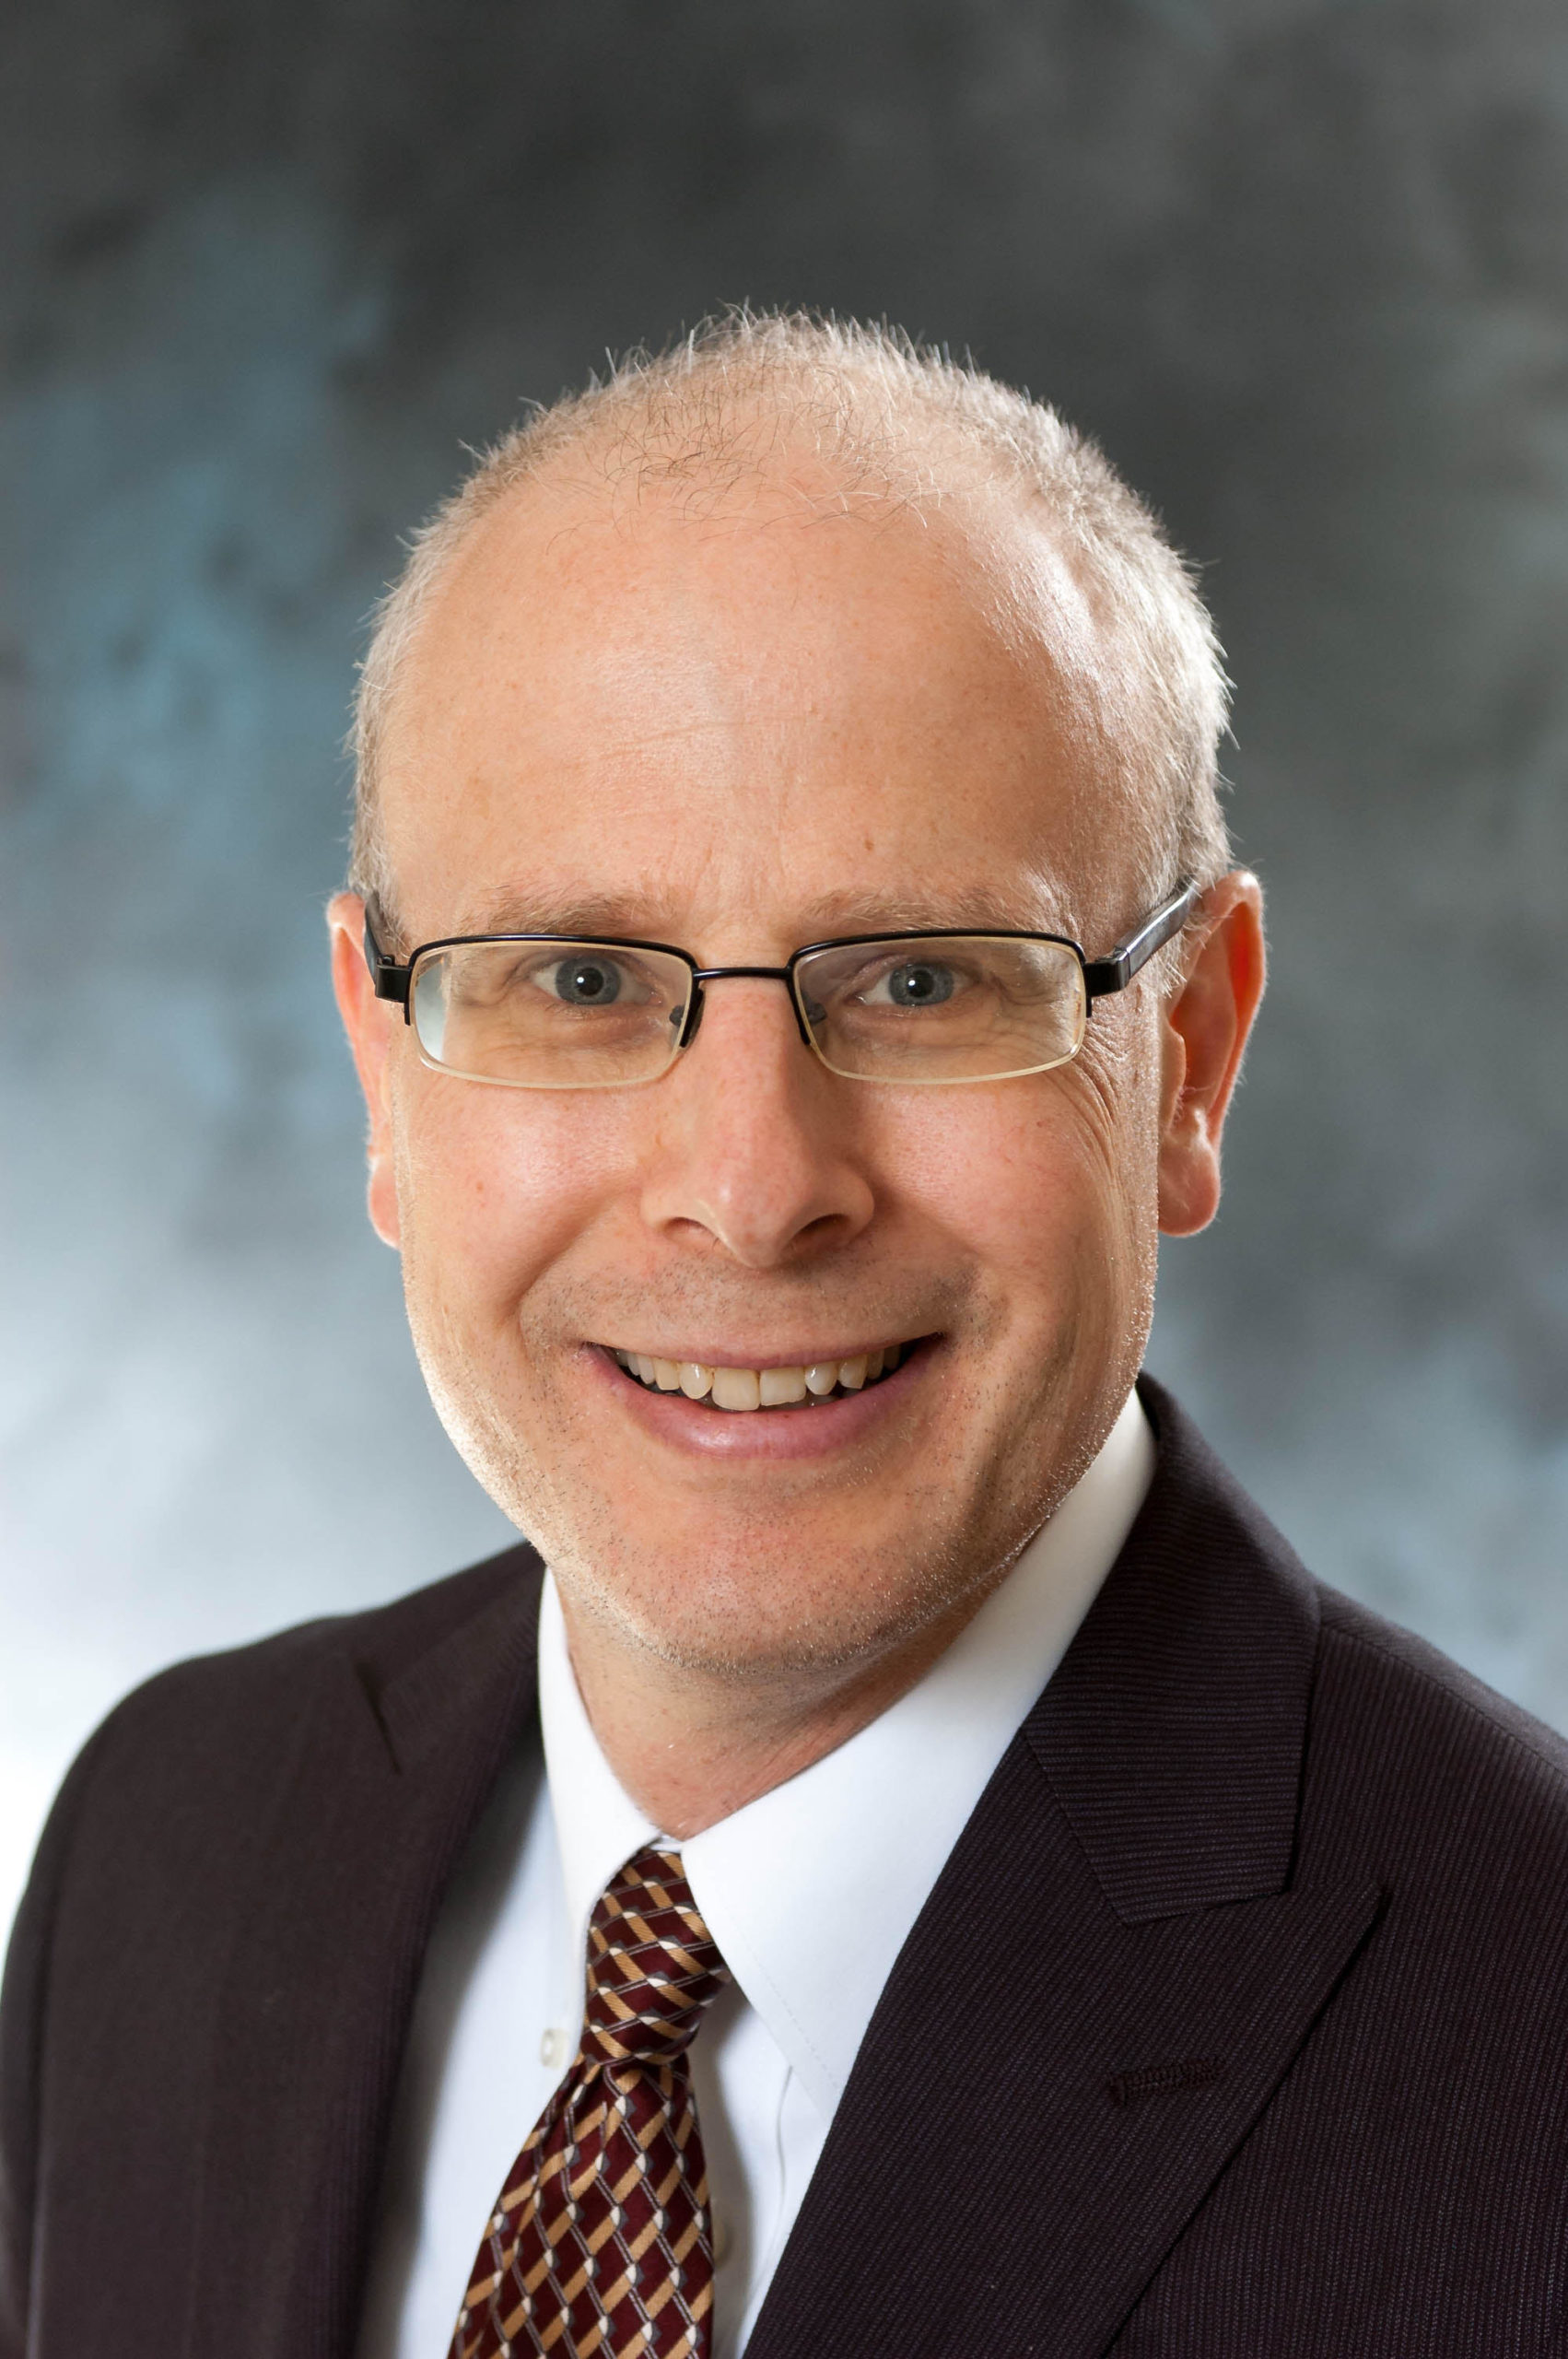 Jon Opgenorth